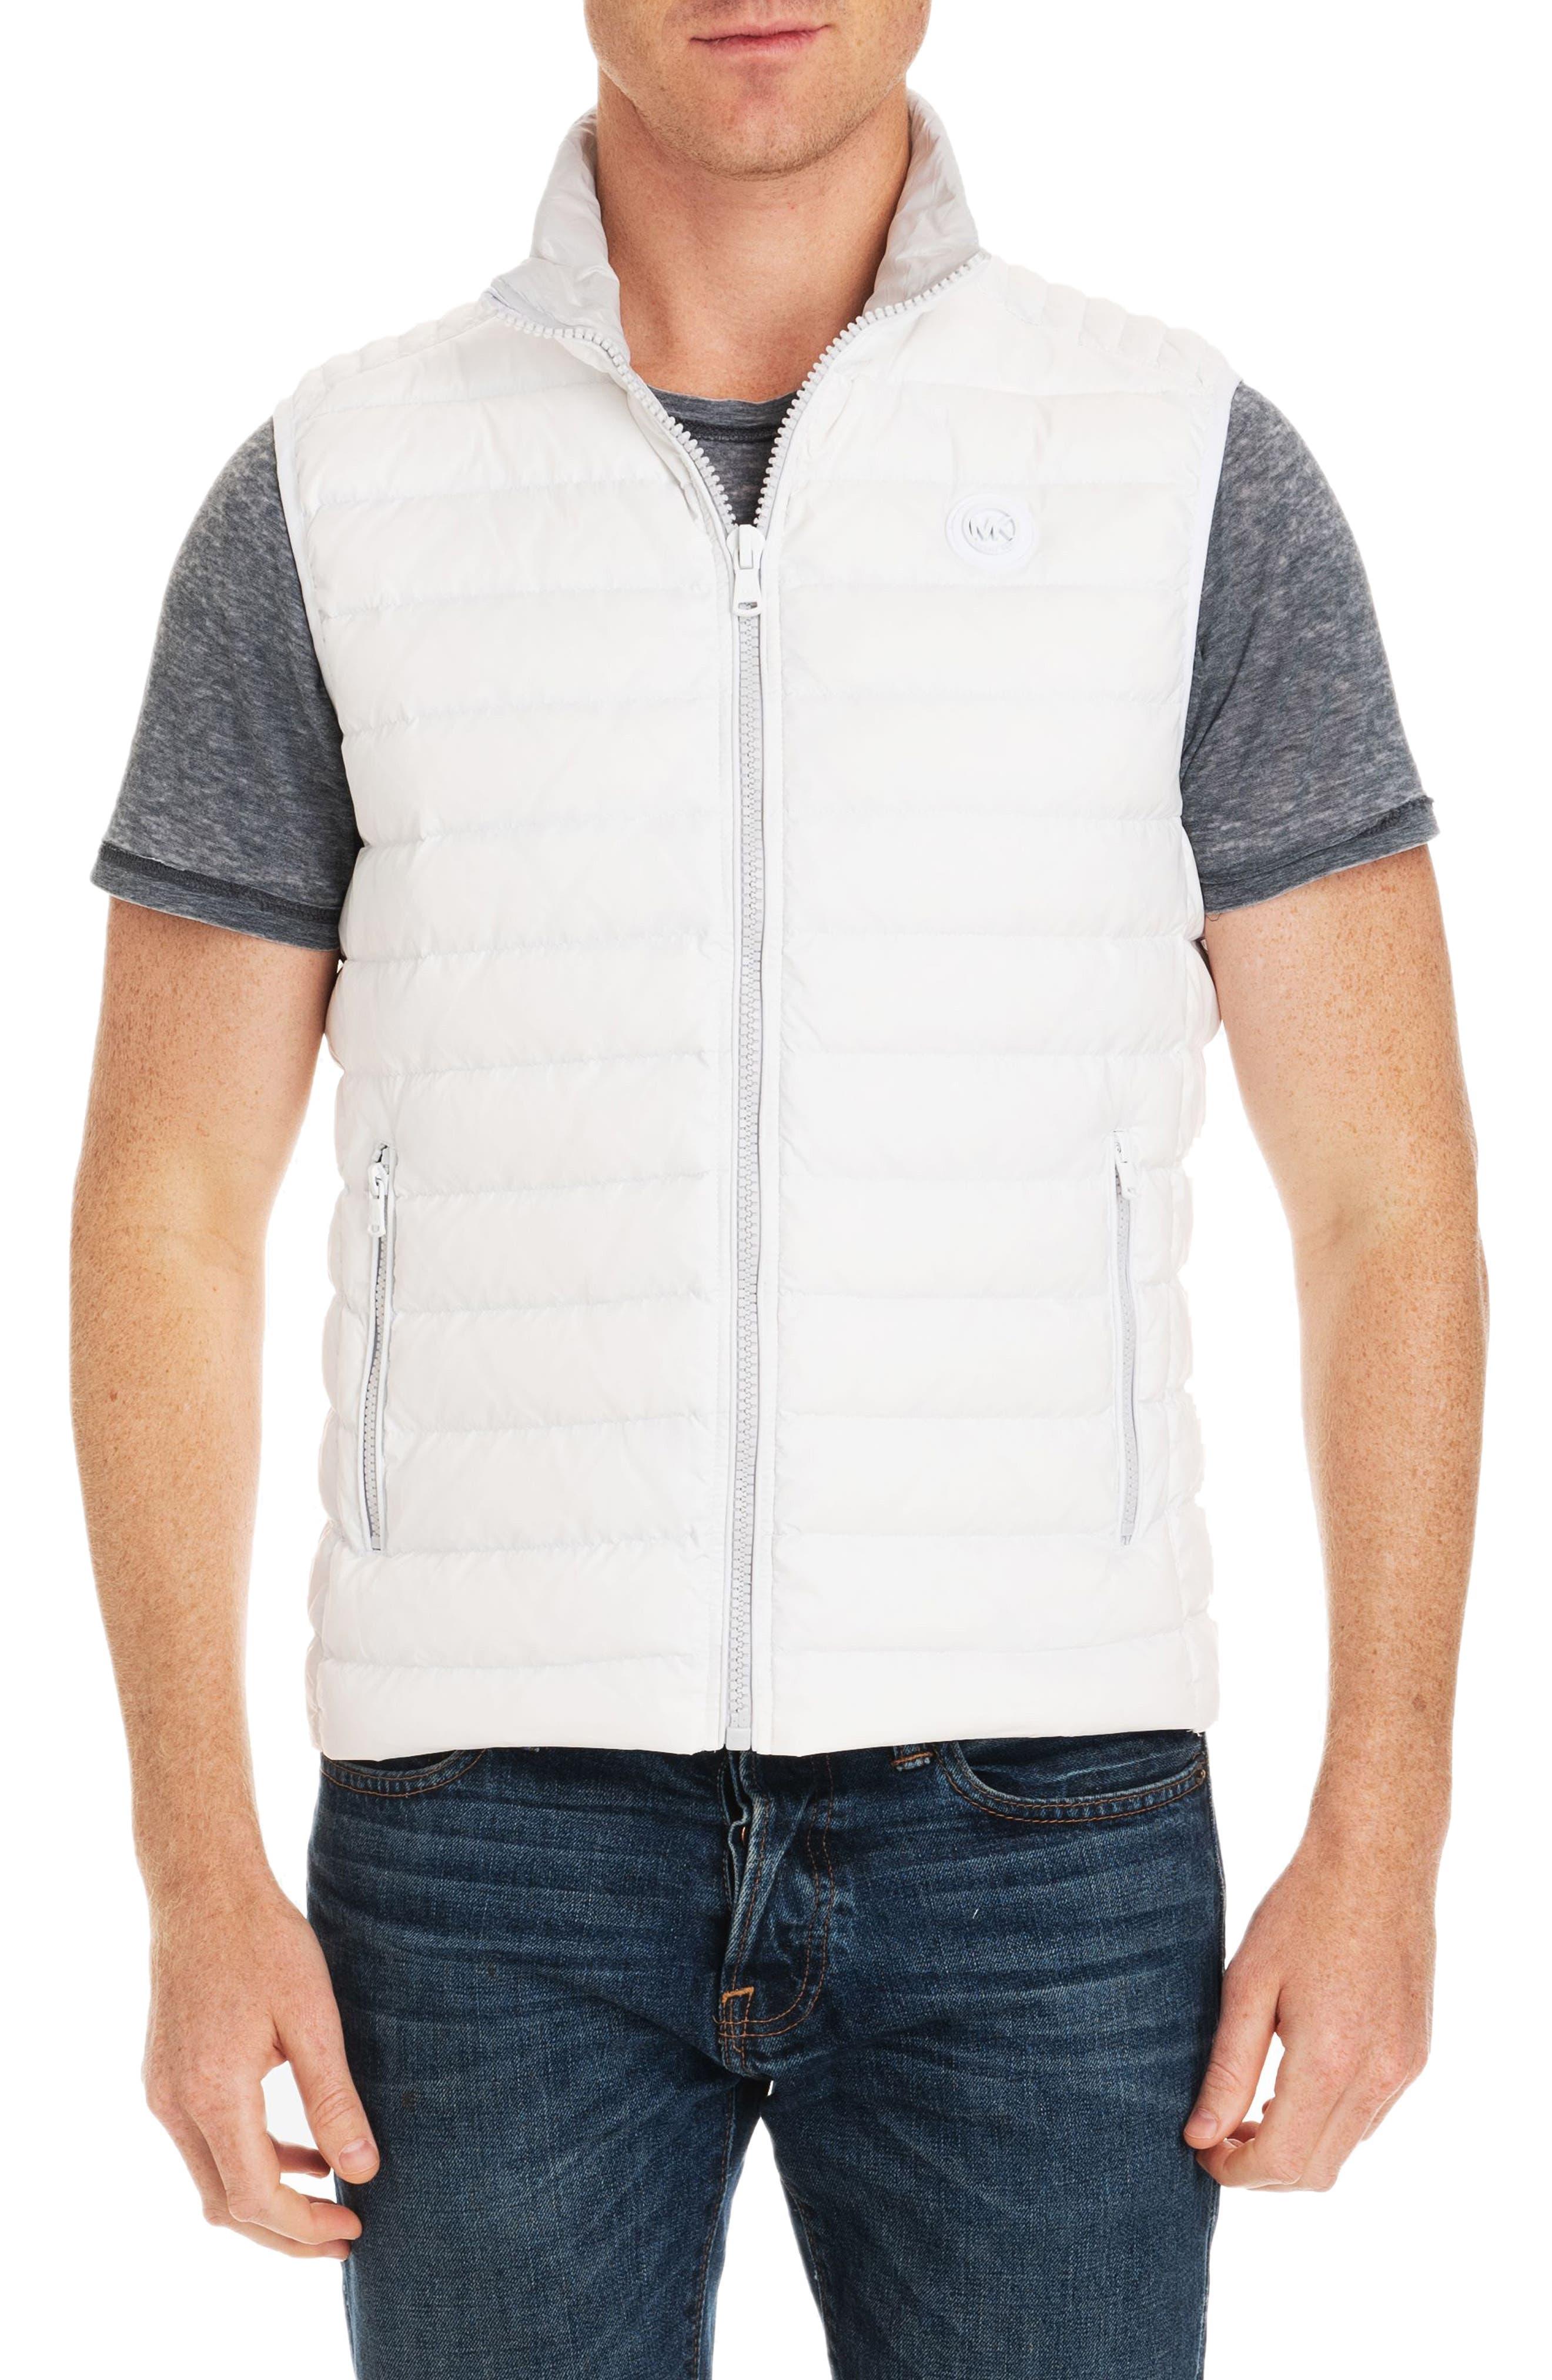 Michael Kors Slim Fit Packable Down Vest, White (Online Only)